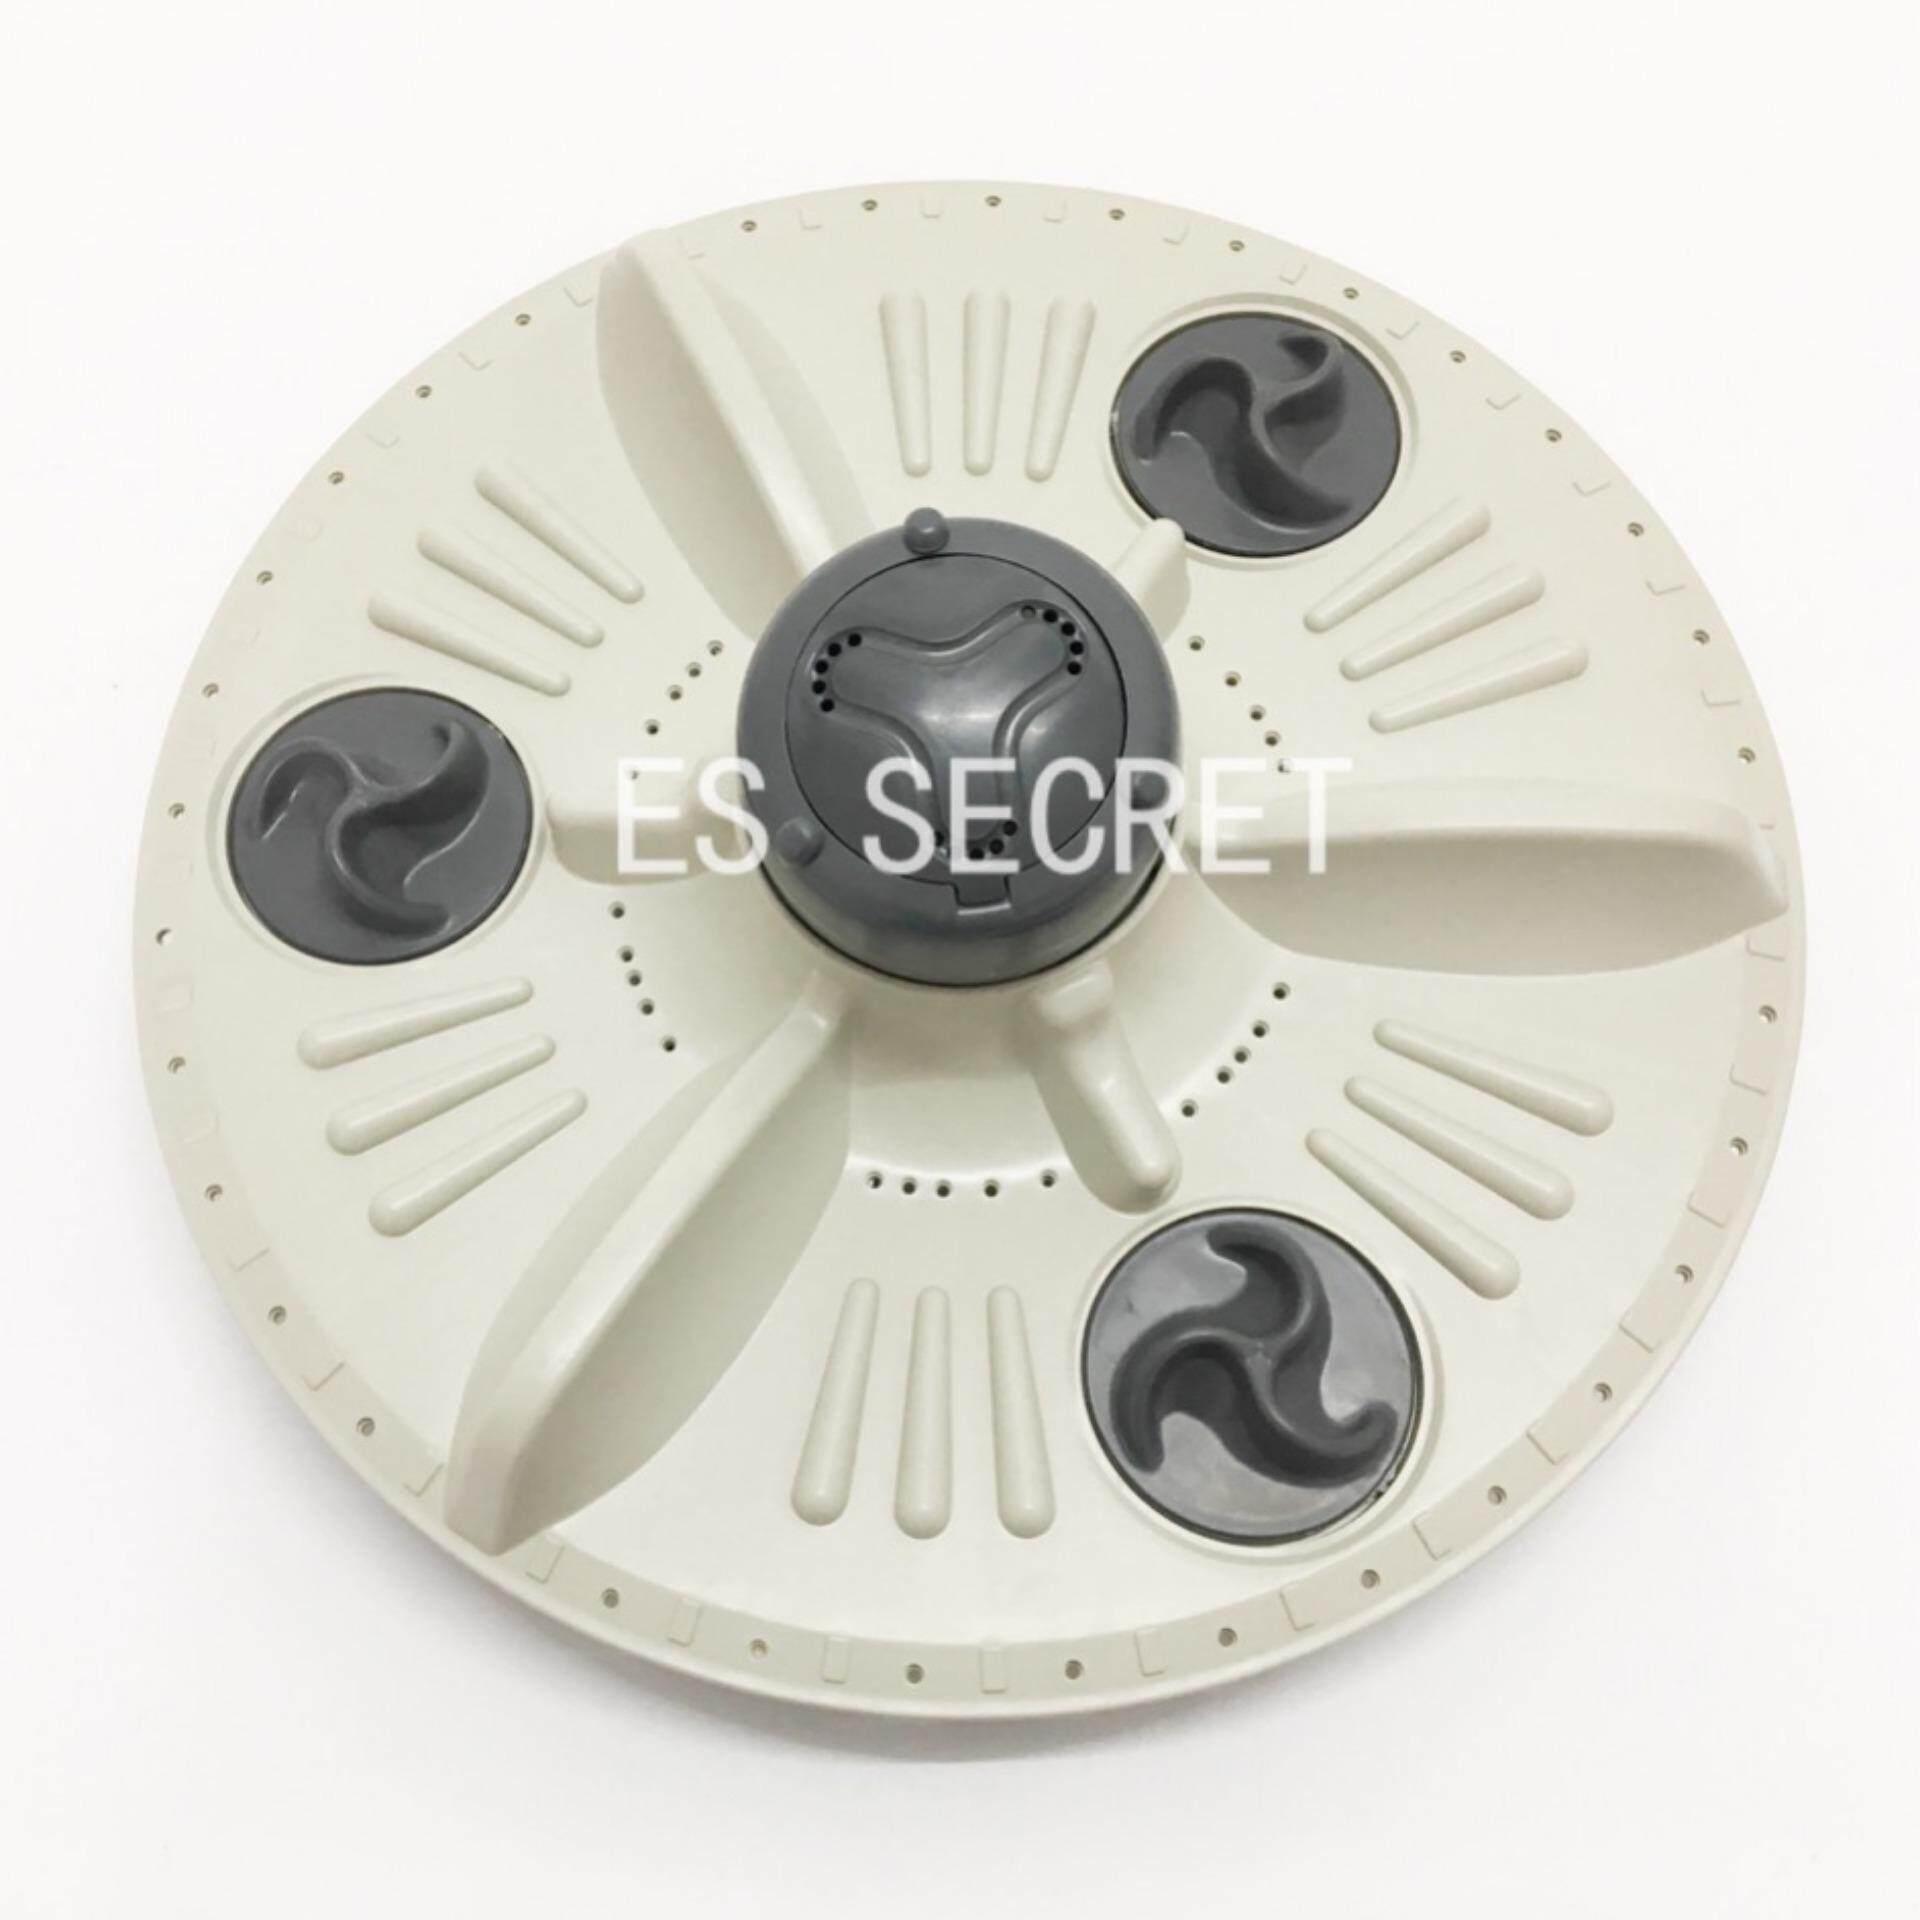 LG Washing Machine Pulsator Dia:375mm 11z 8-9kg